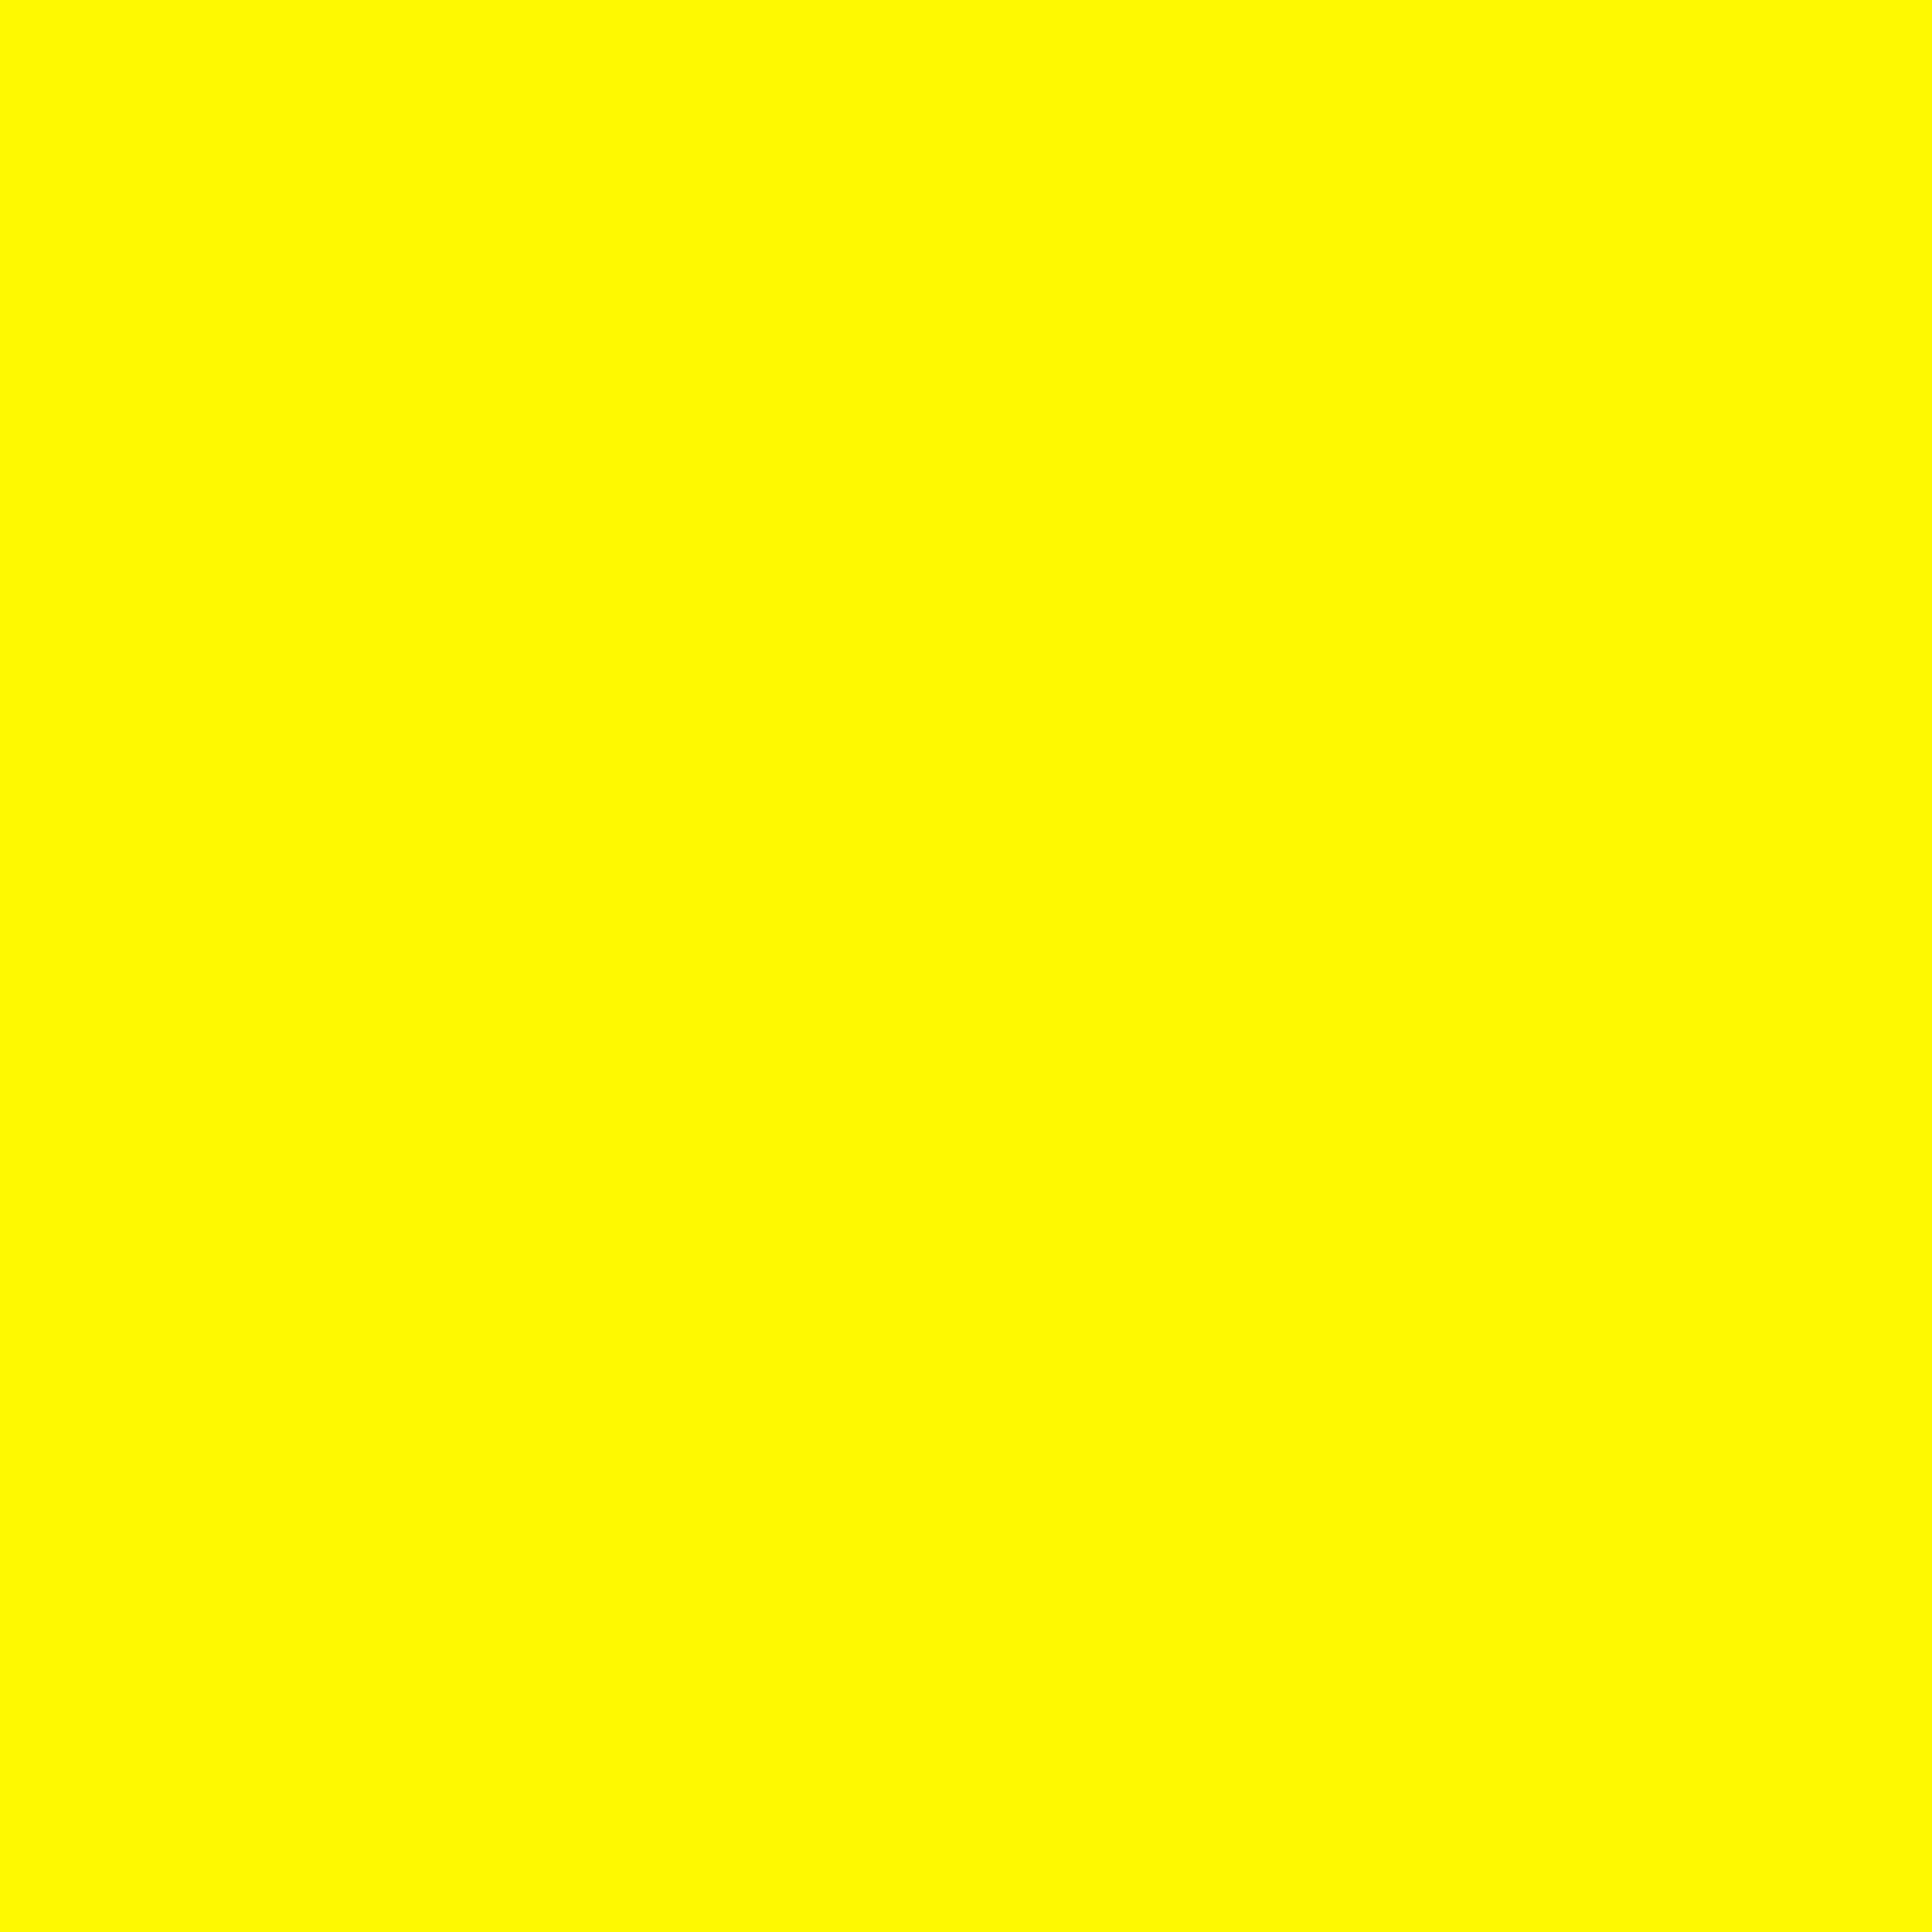 2732x2732 Lemon Solid Color Background